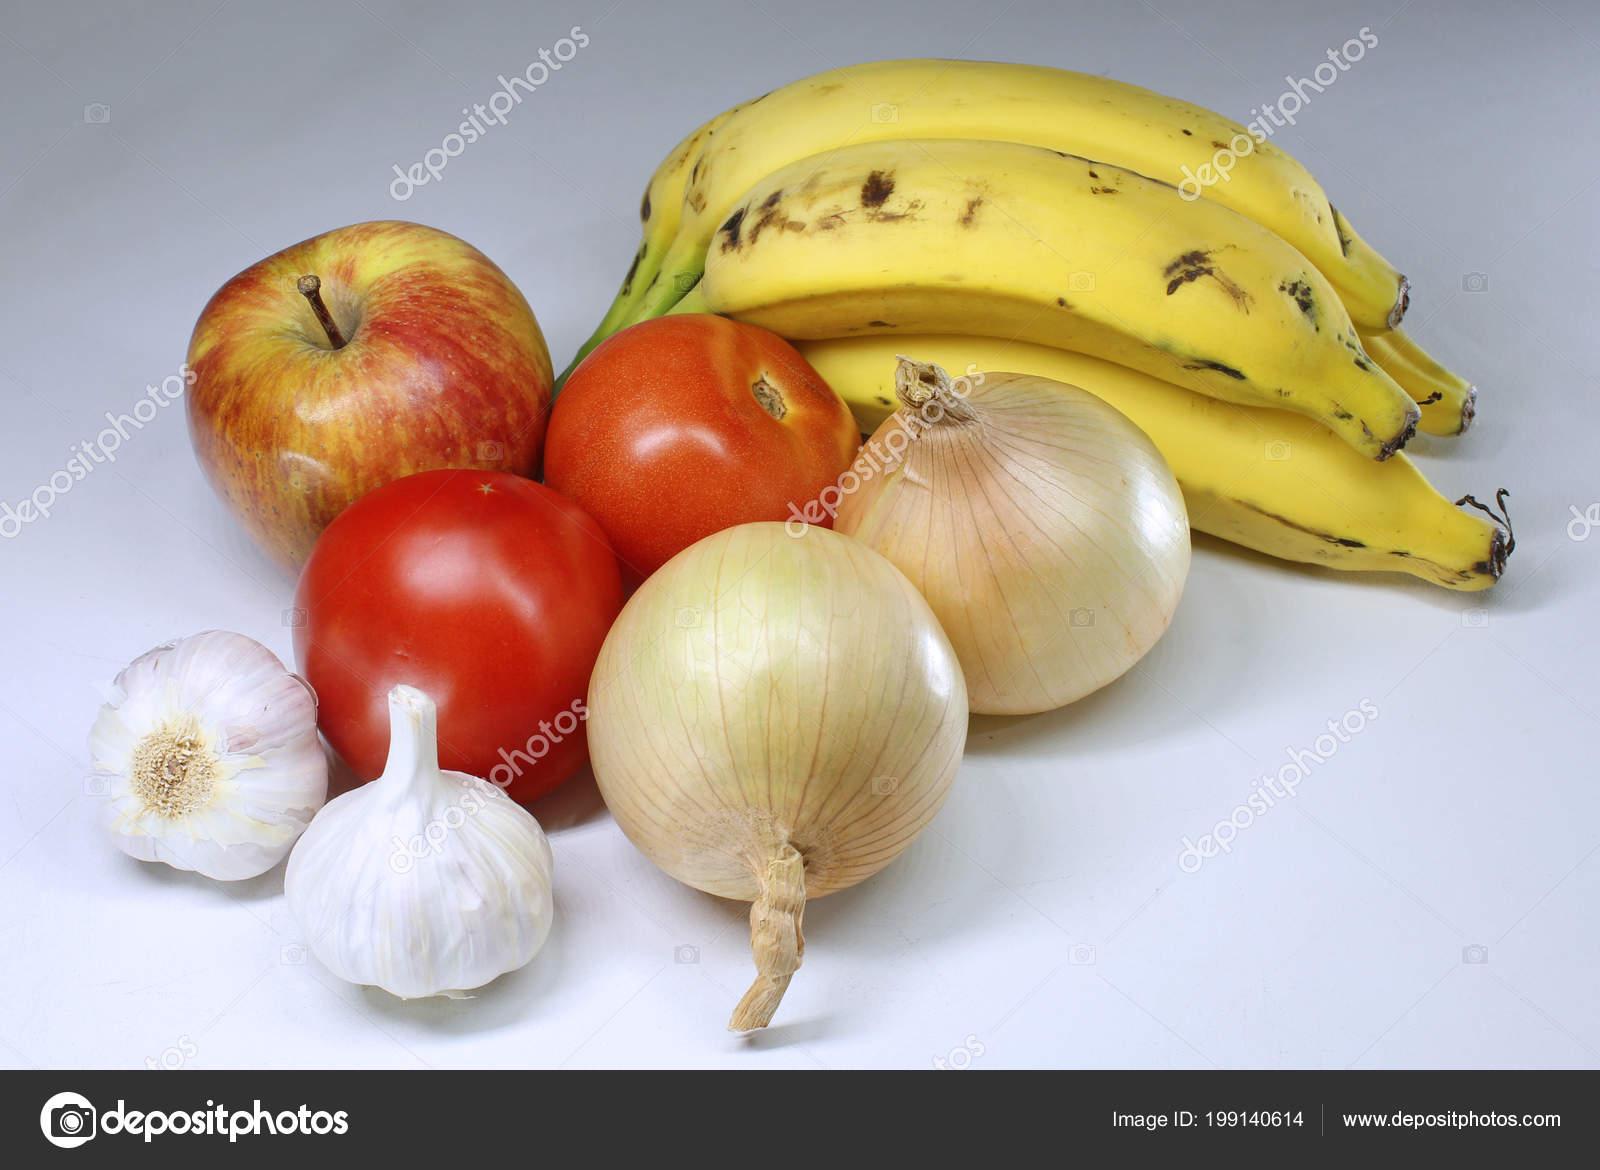 alimentos con probióticos naturales — fotos de stock © marcotga